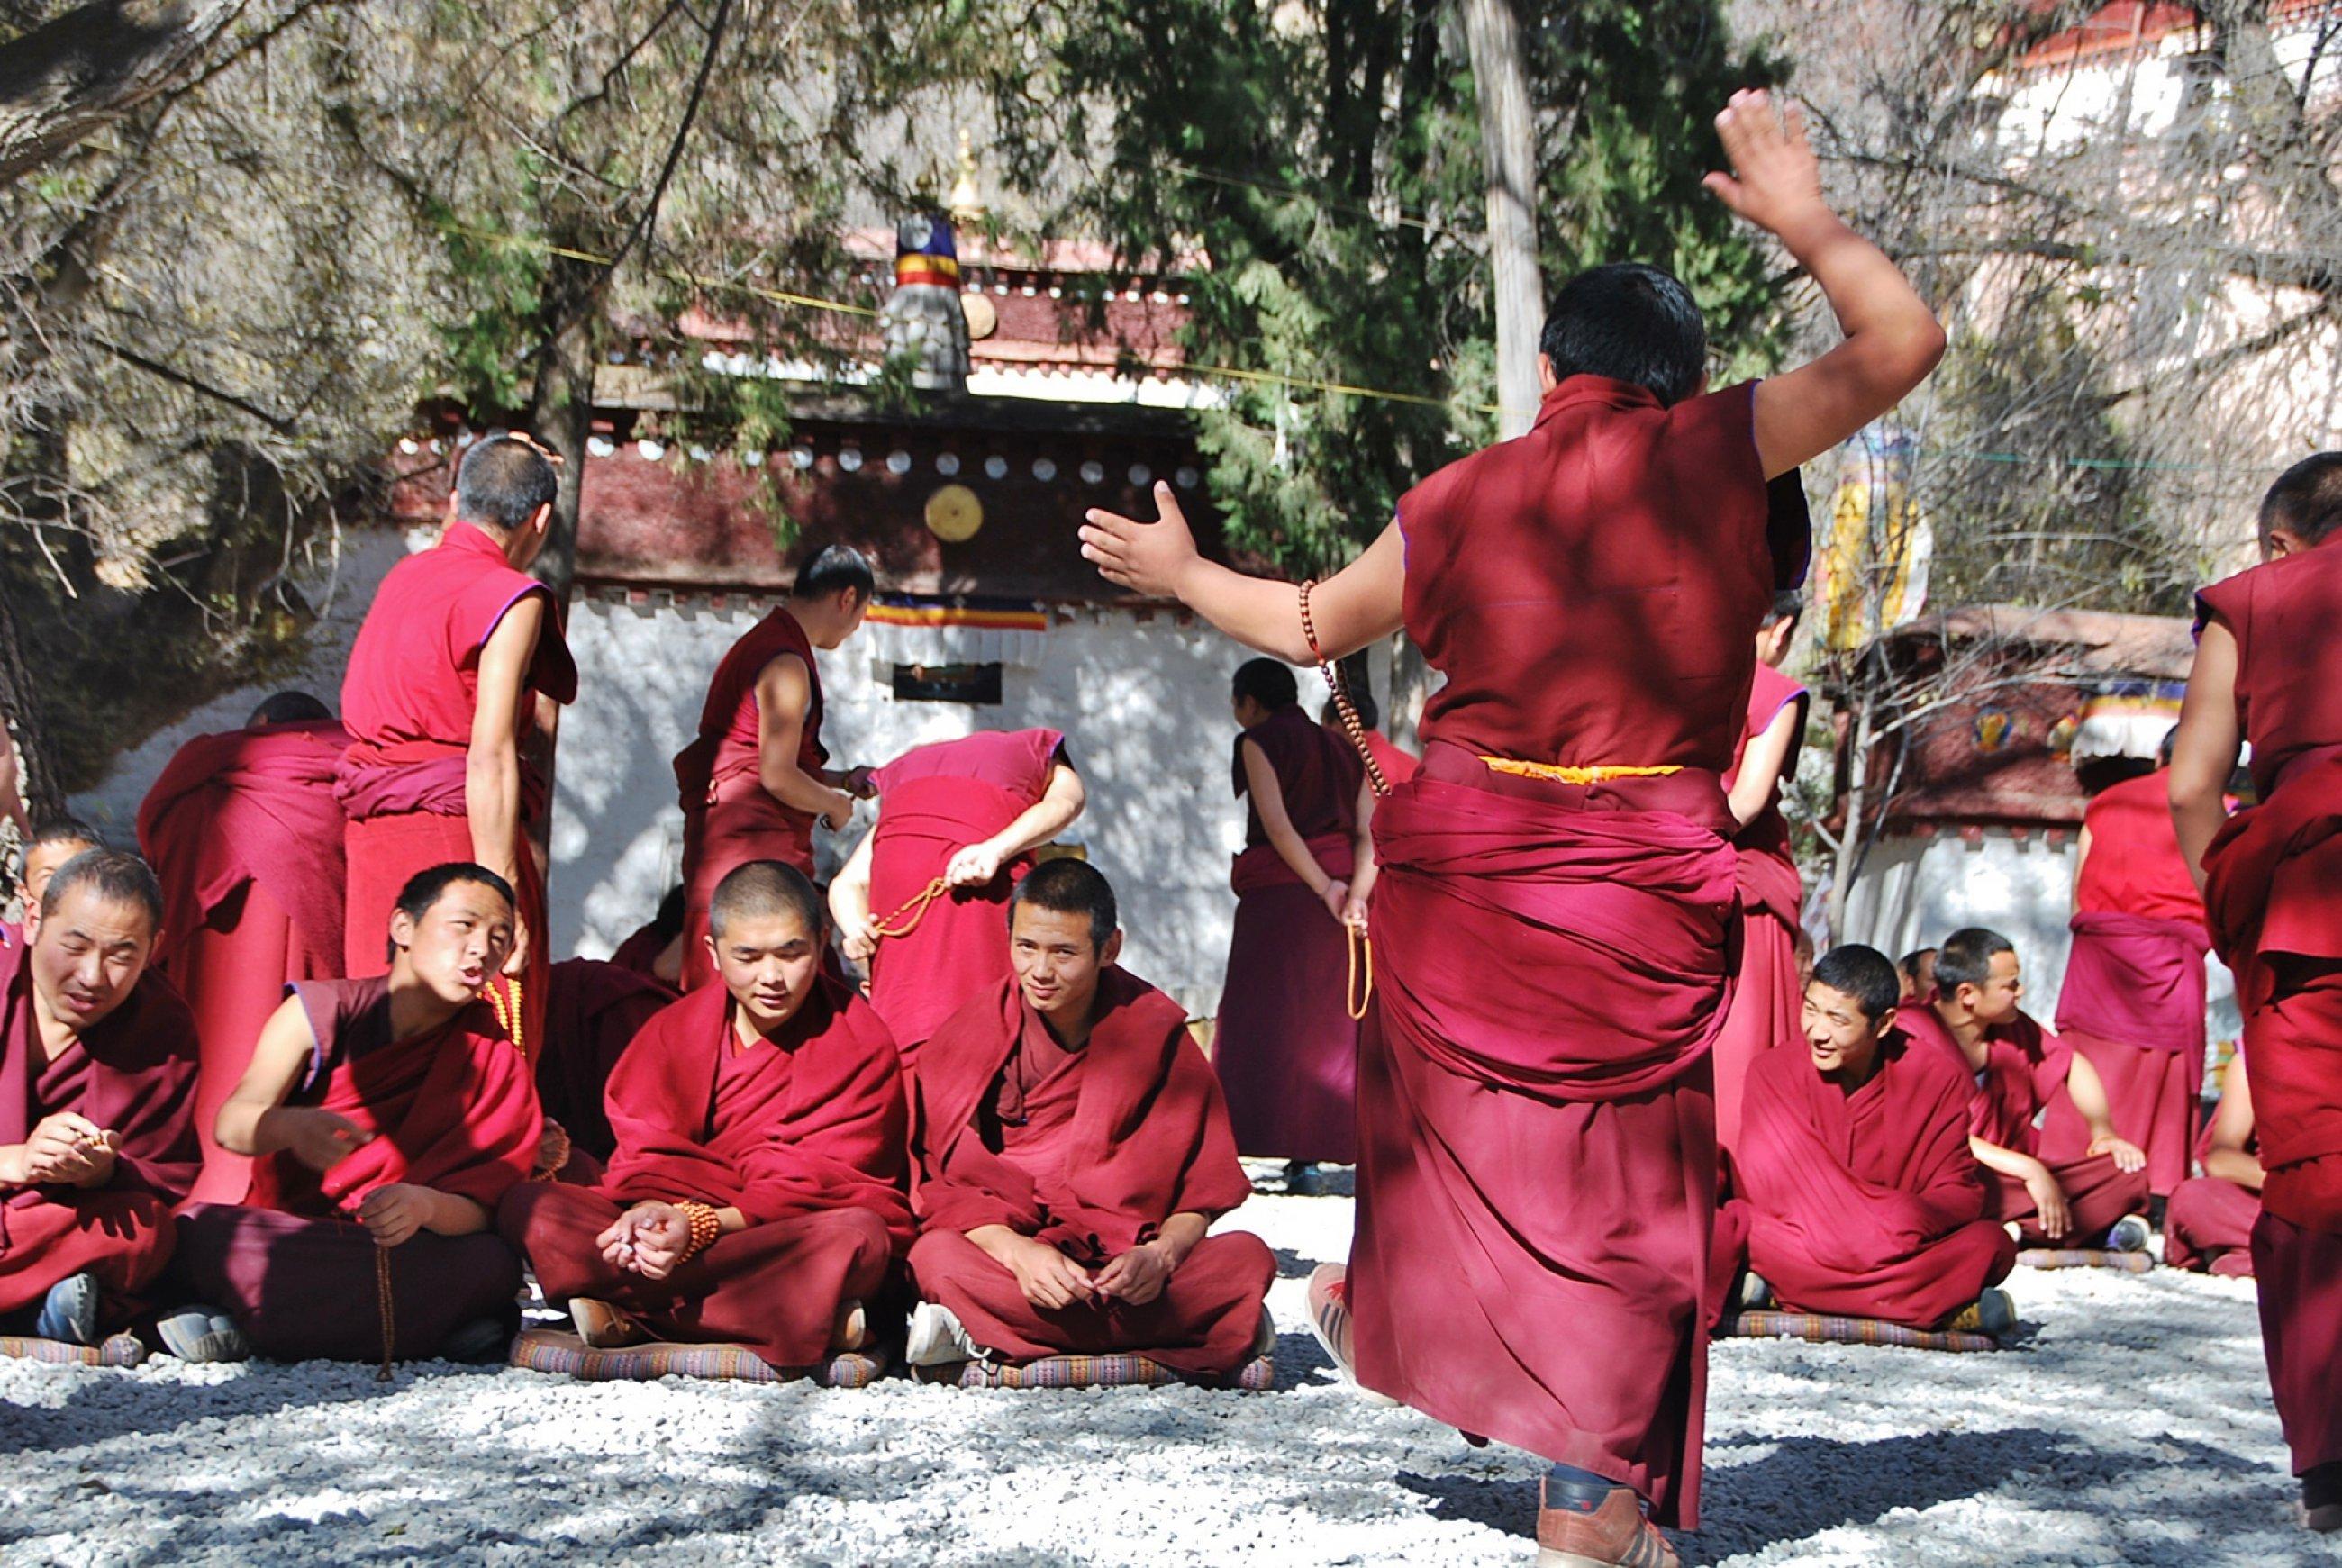 https://bubo.sk/uploads/galleries/16269/tibet-sera-mirka-sulka.jpg